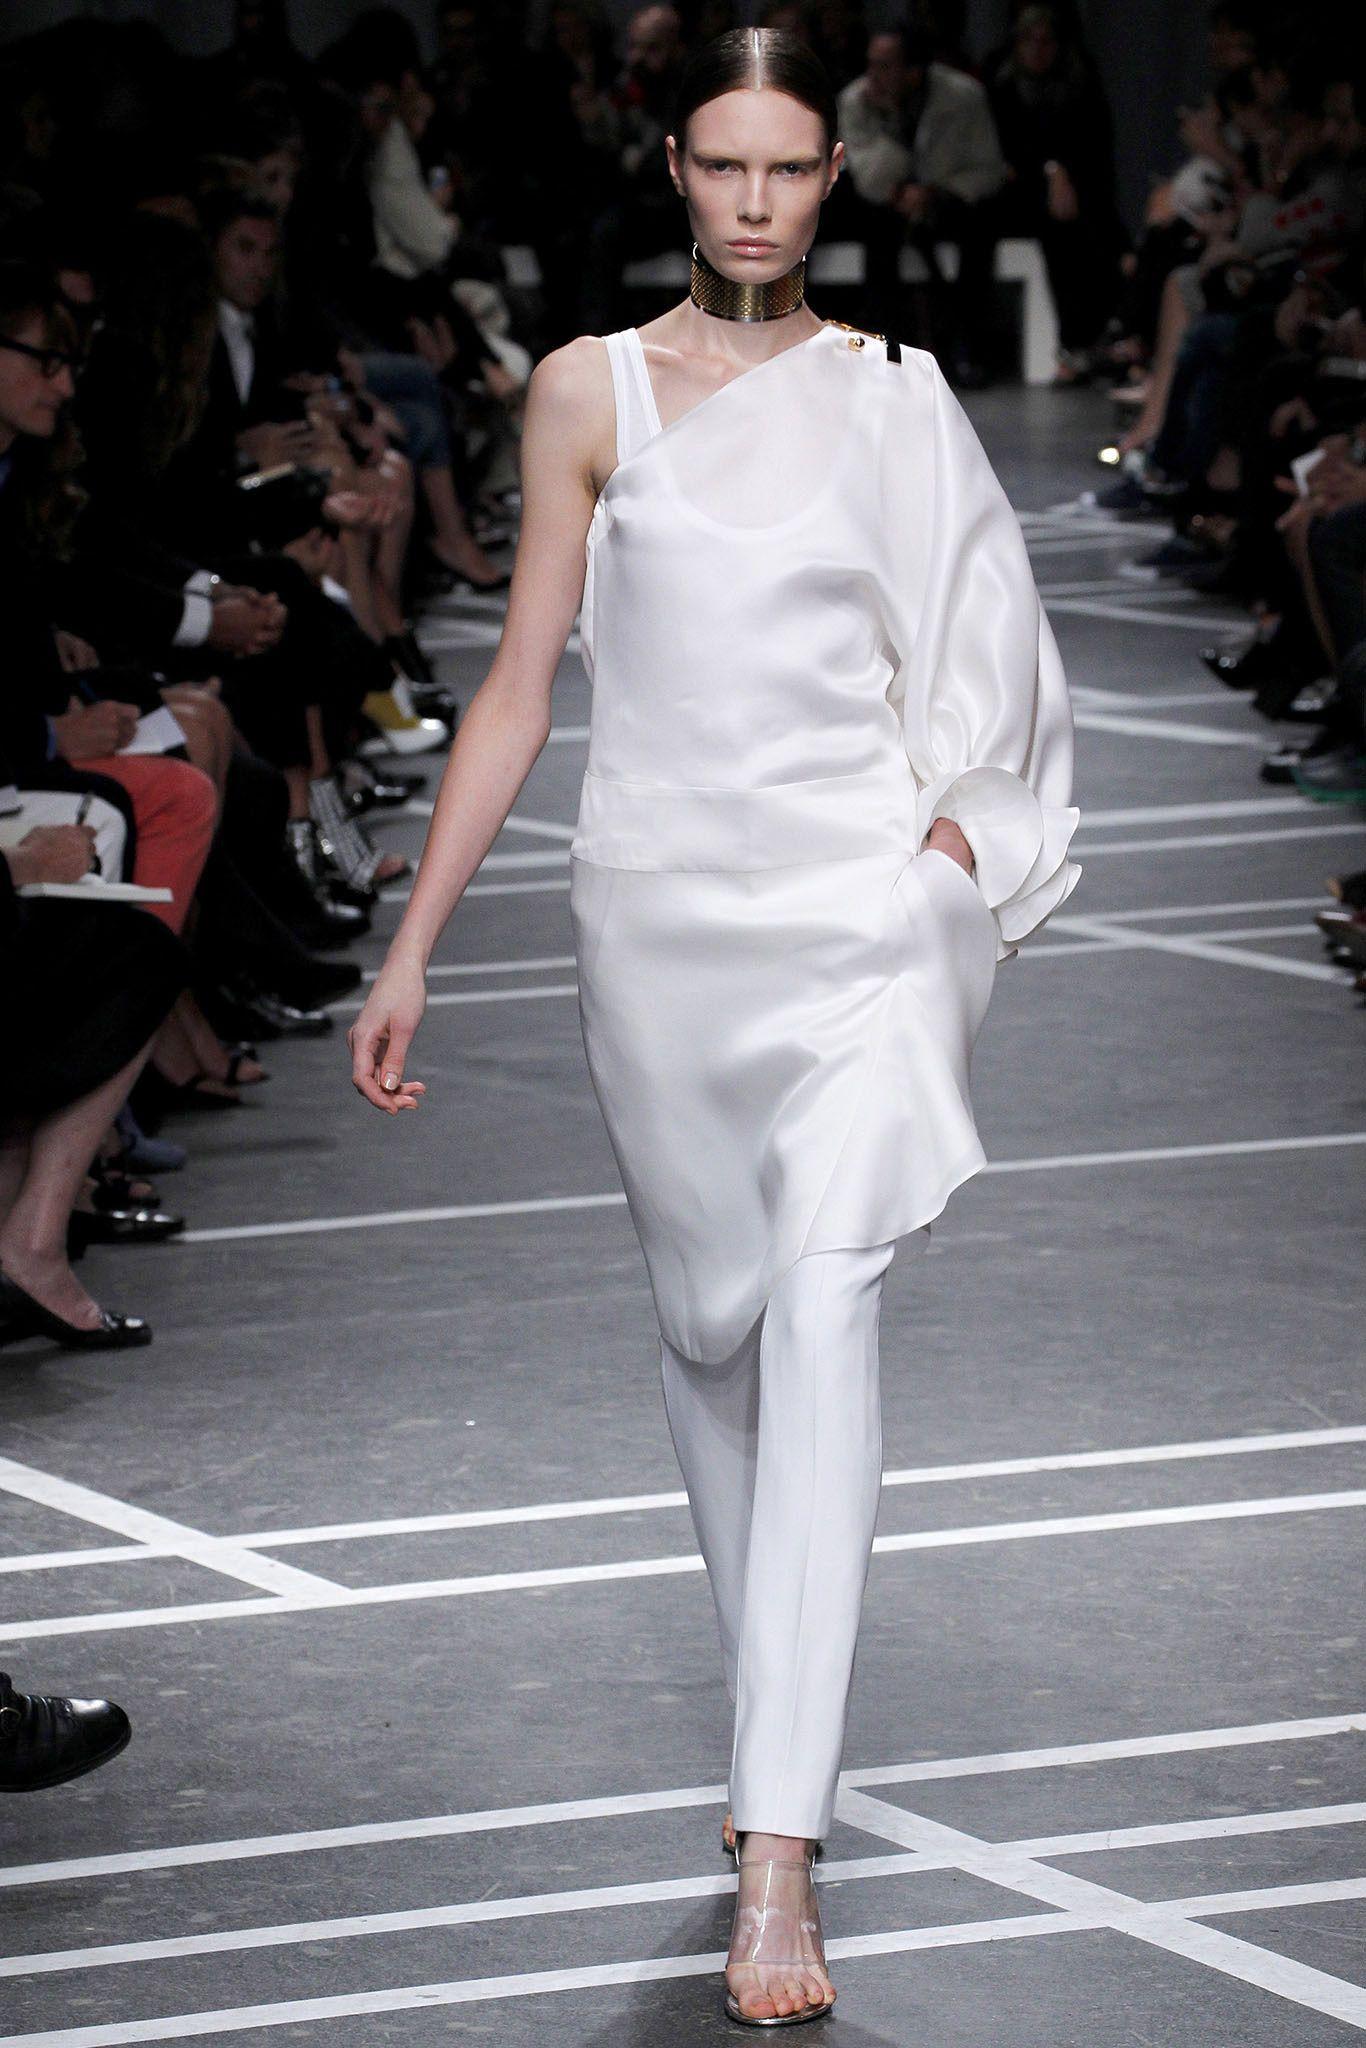 Givenchy Spring 2013 Ready-to-Wear Fashion Show - Alexandra Martynova (CITY)